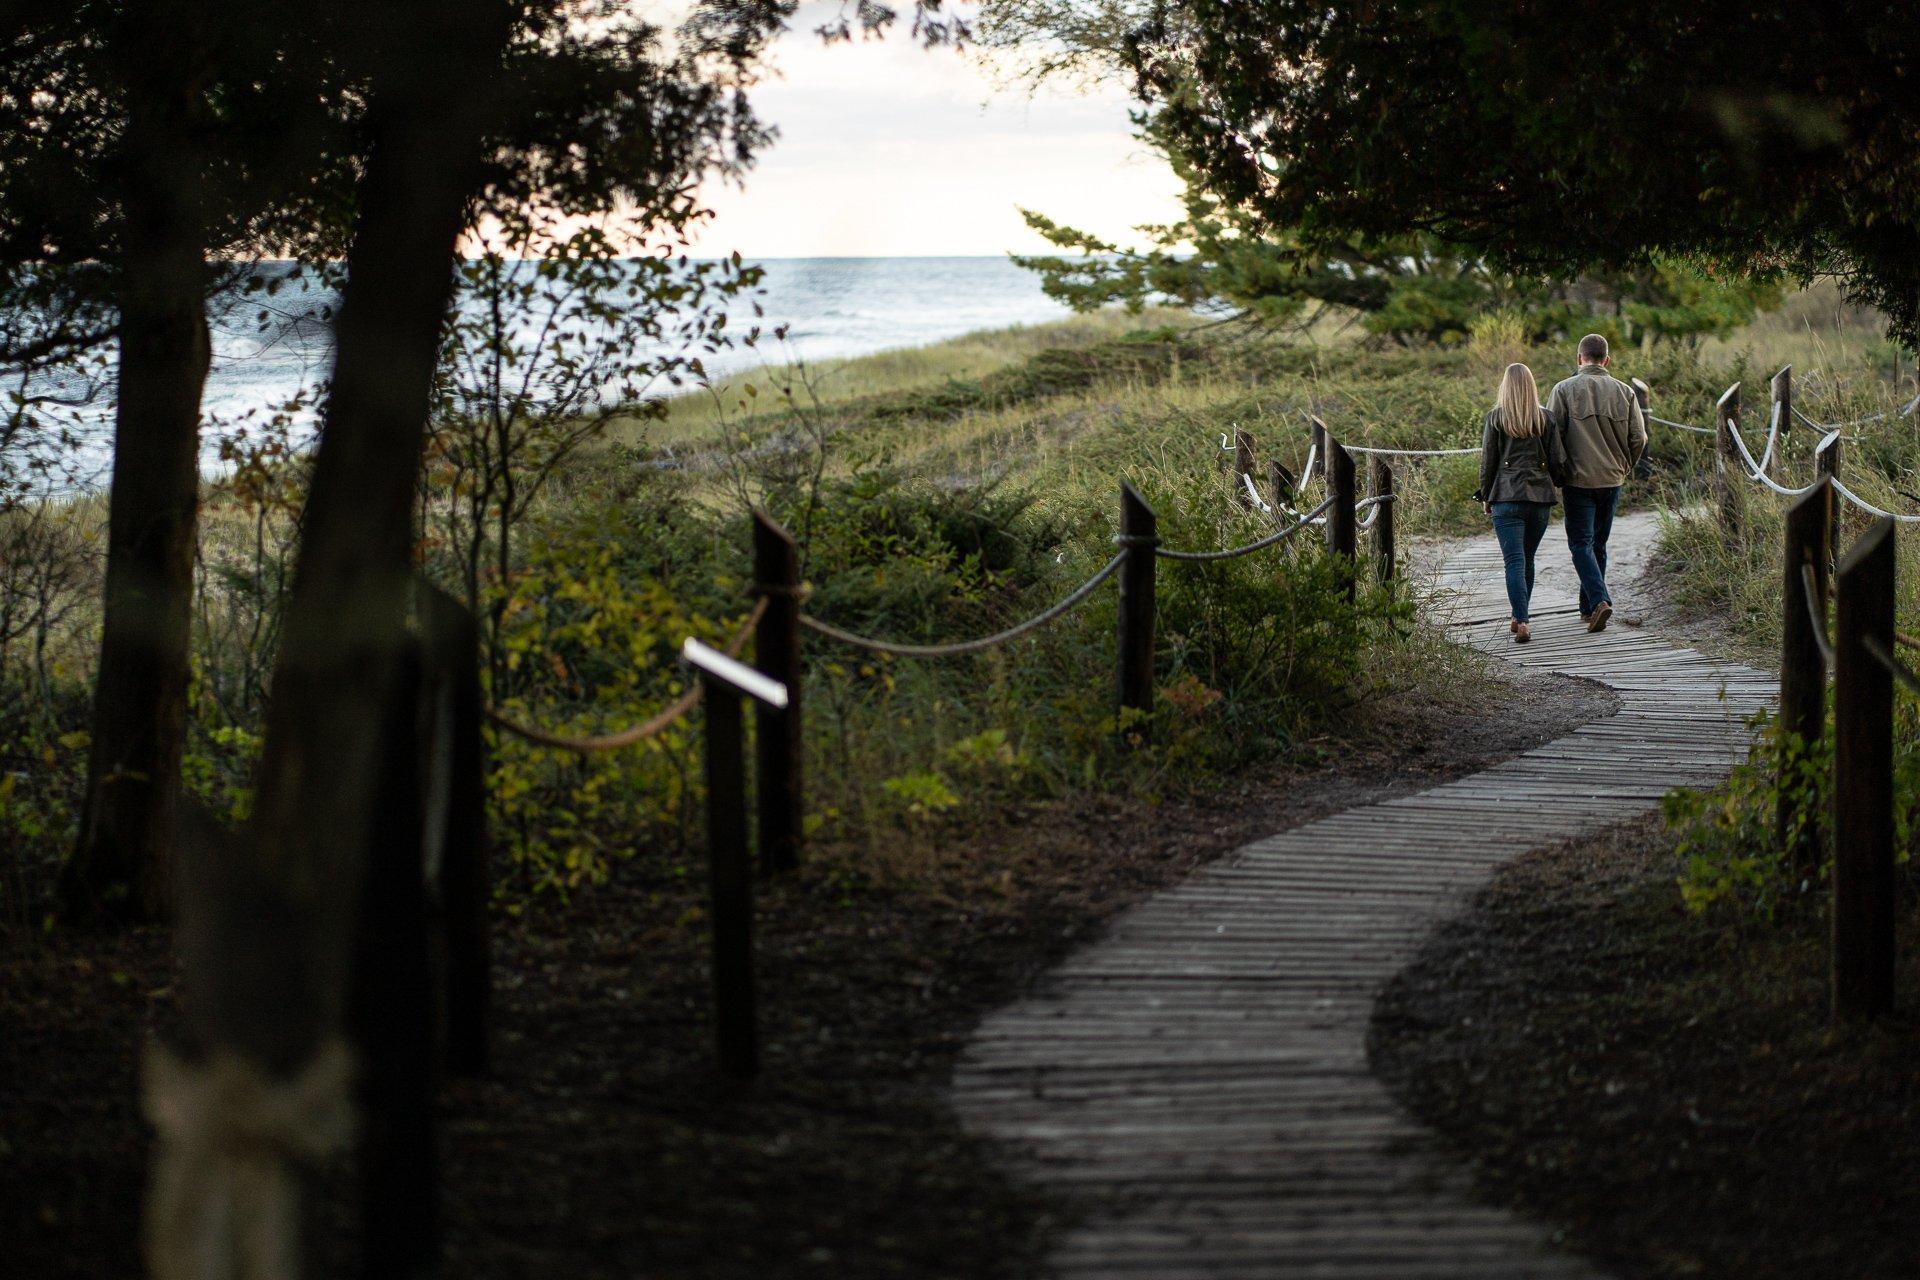 lakeshore-curve-path-couple